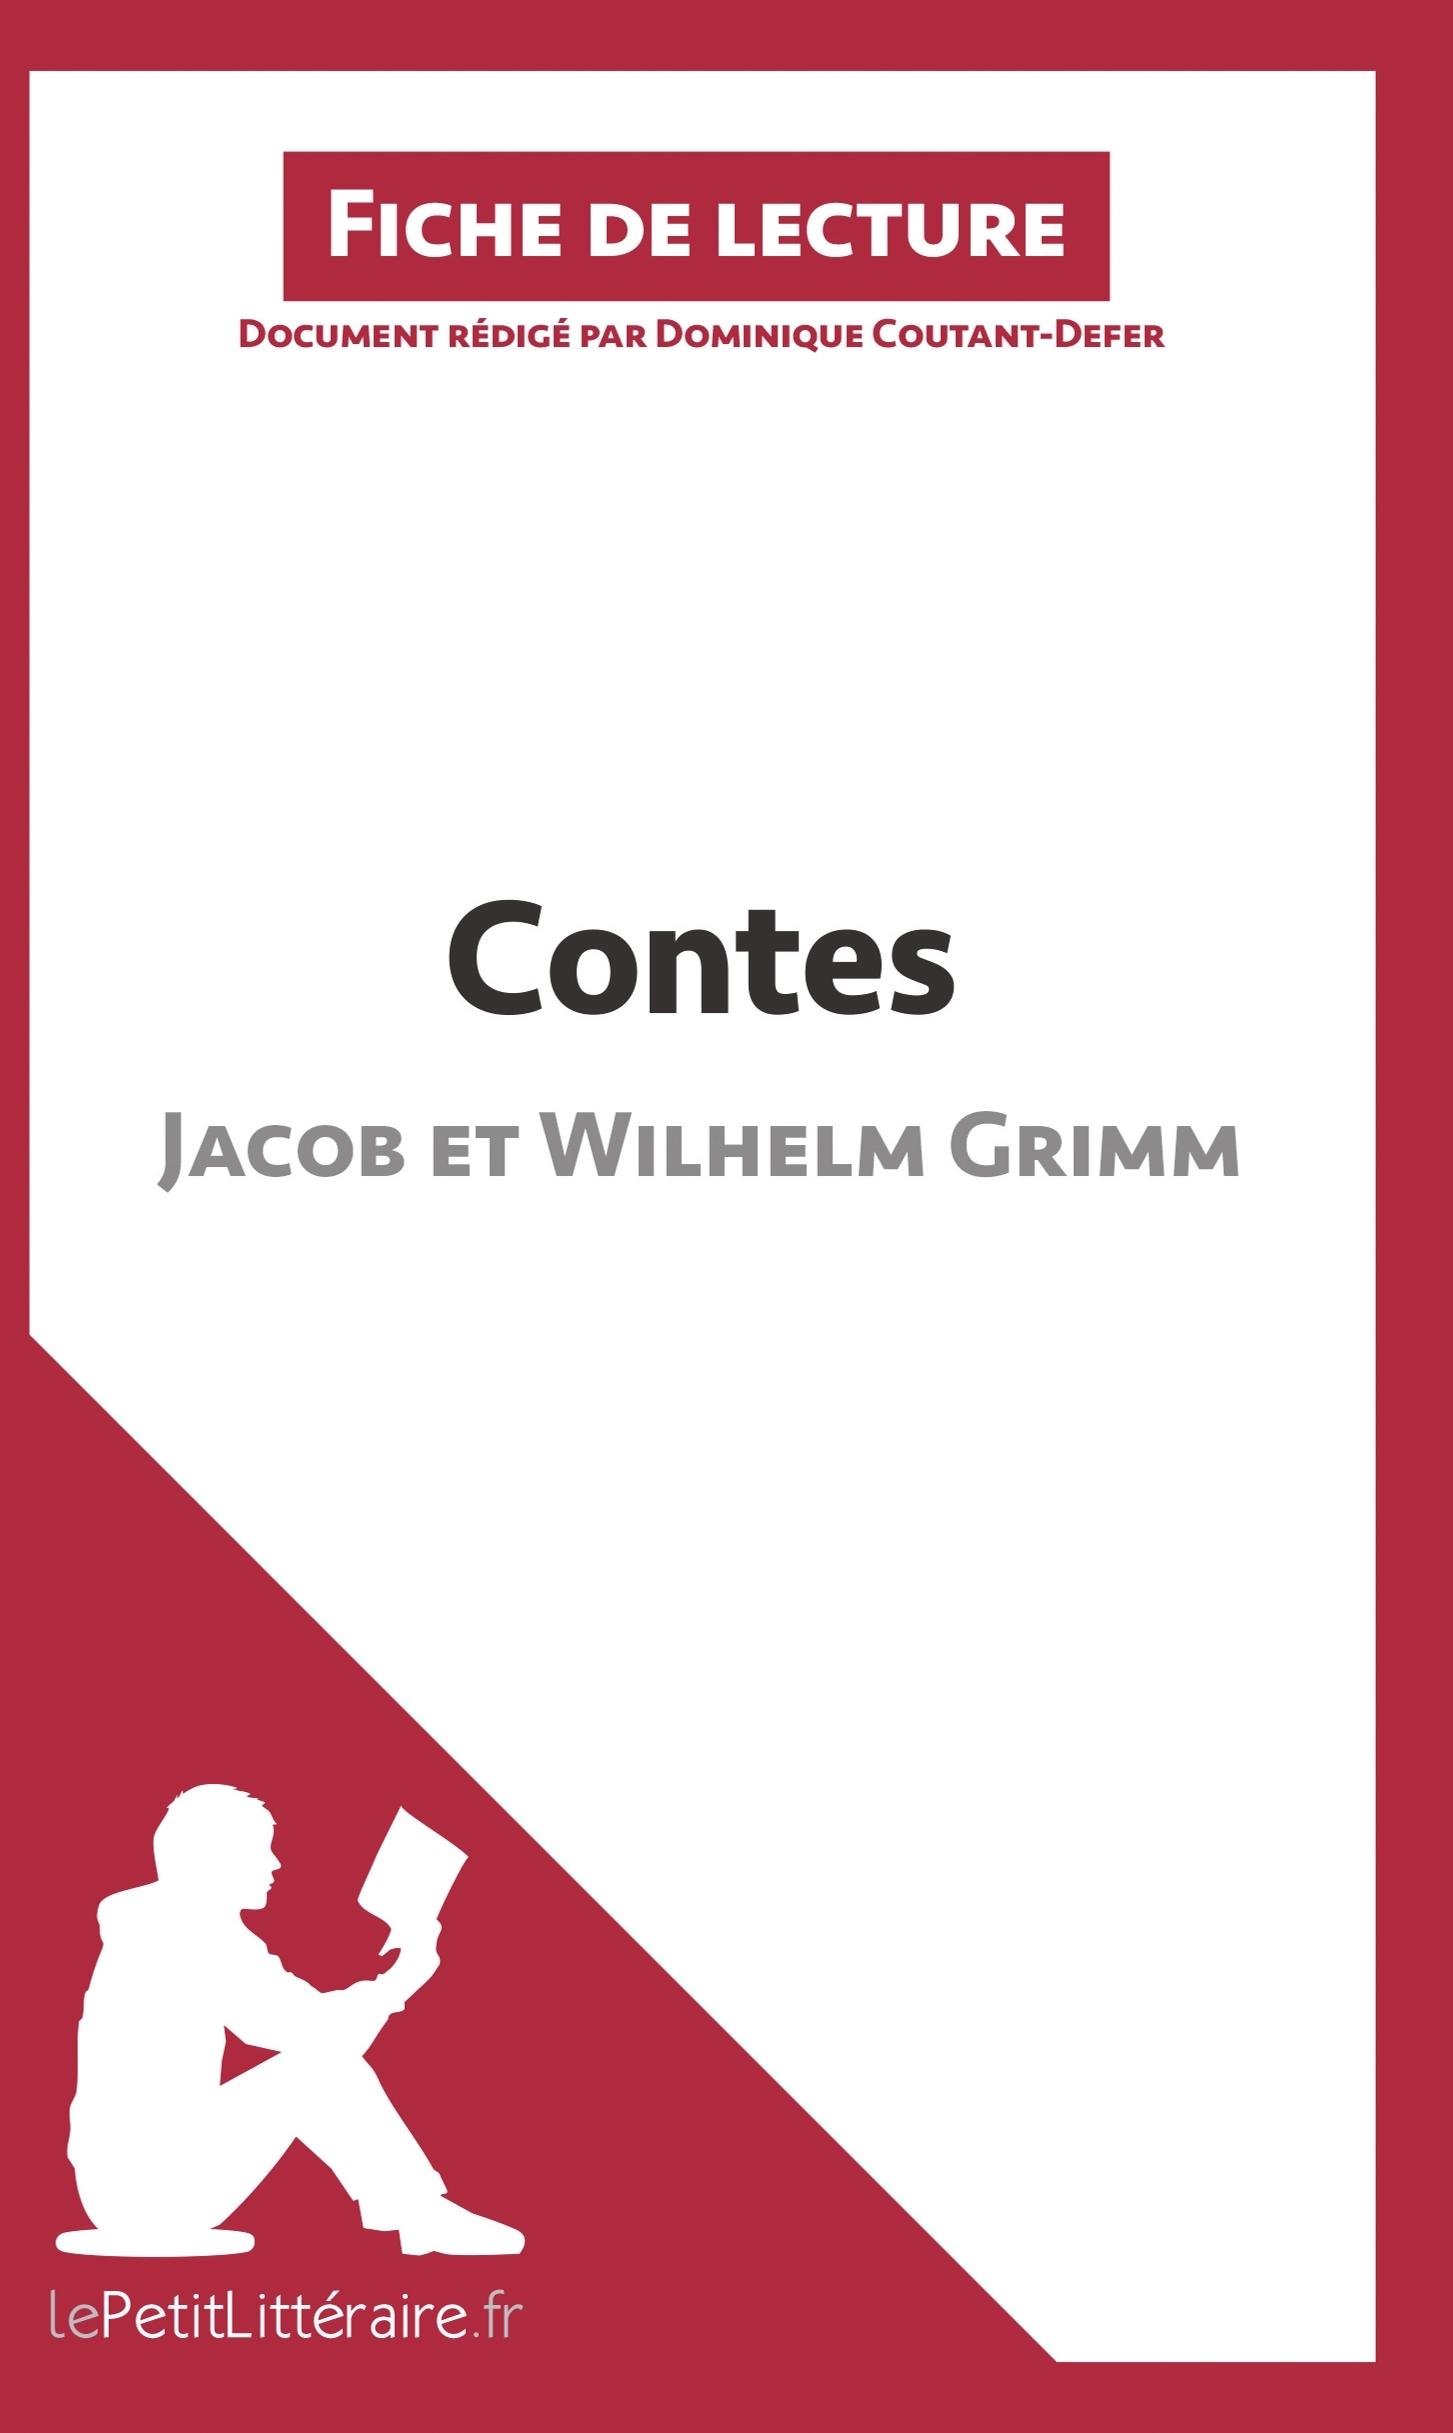 ANALYSE CONTES DES FRERES GRIMM ANALYSE COMPLETE DE L UVRE ET RESUME